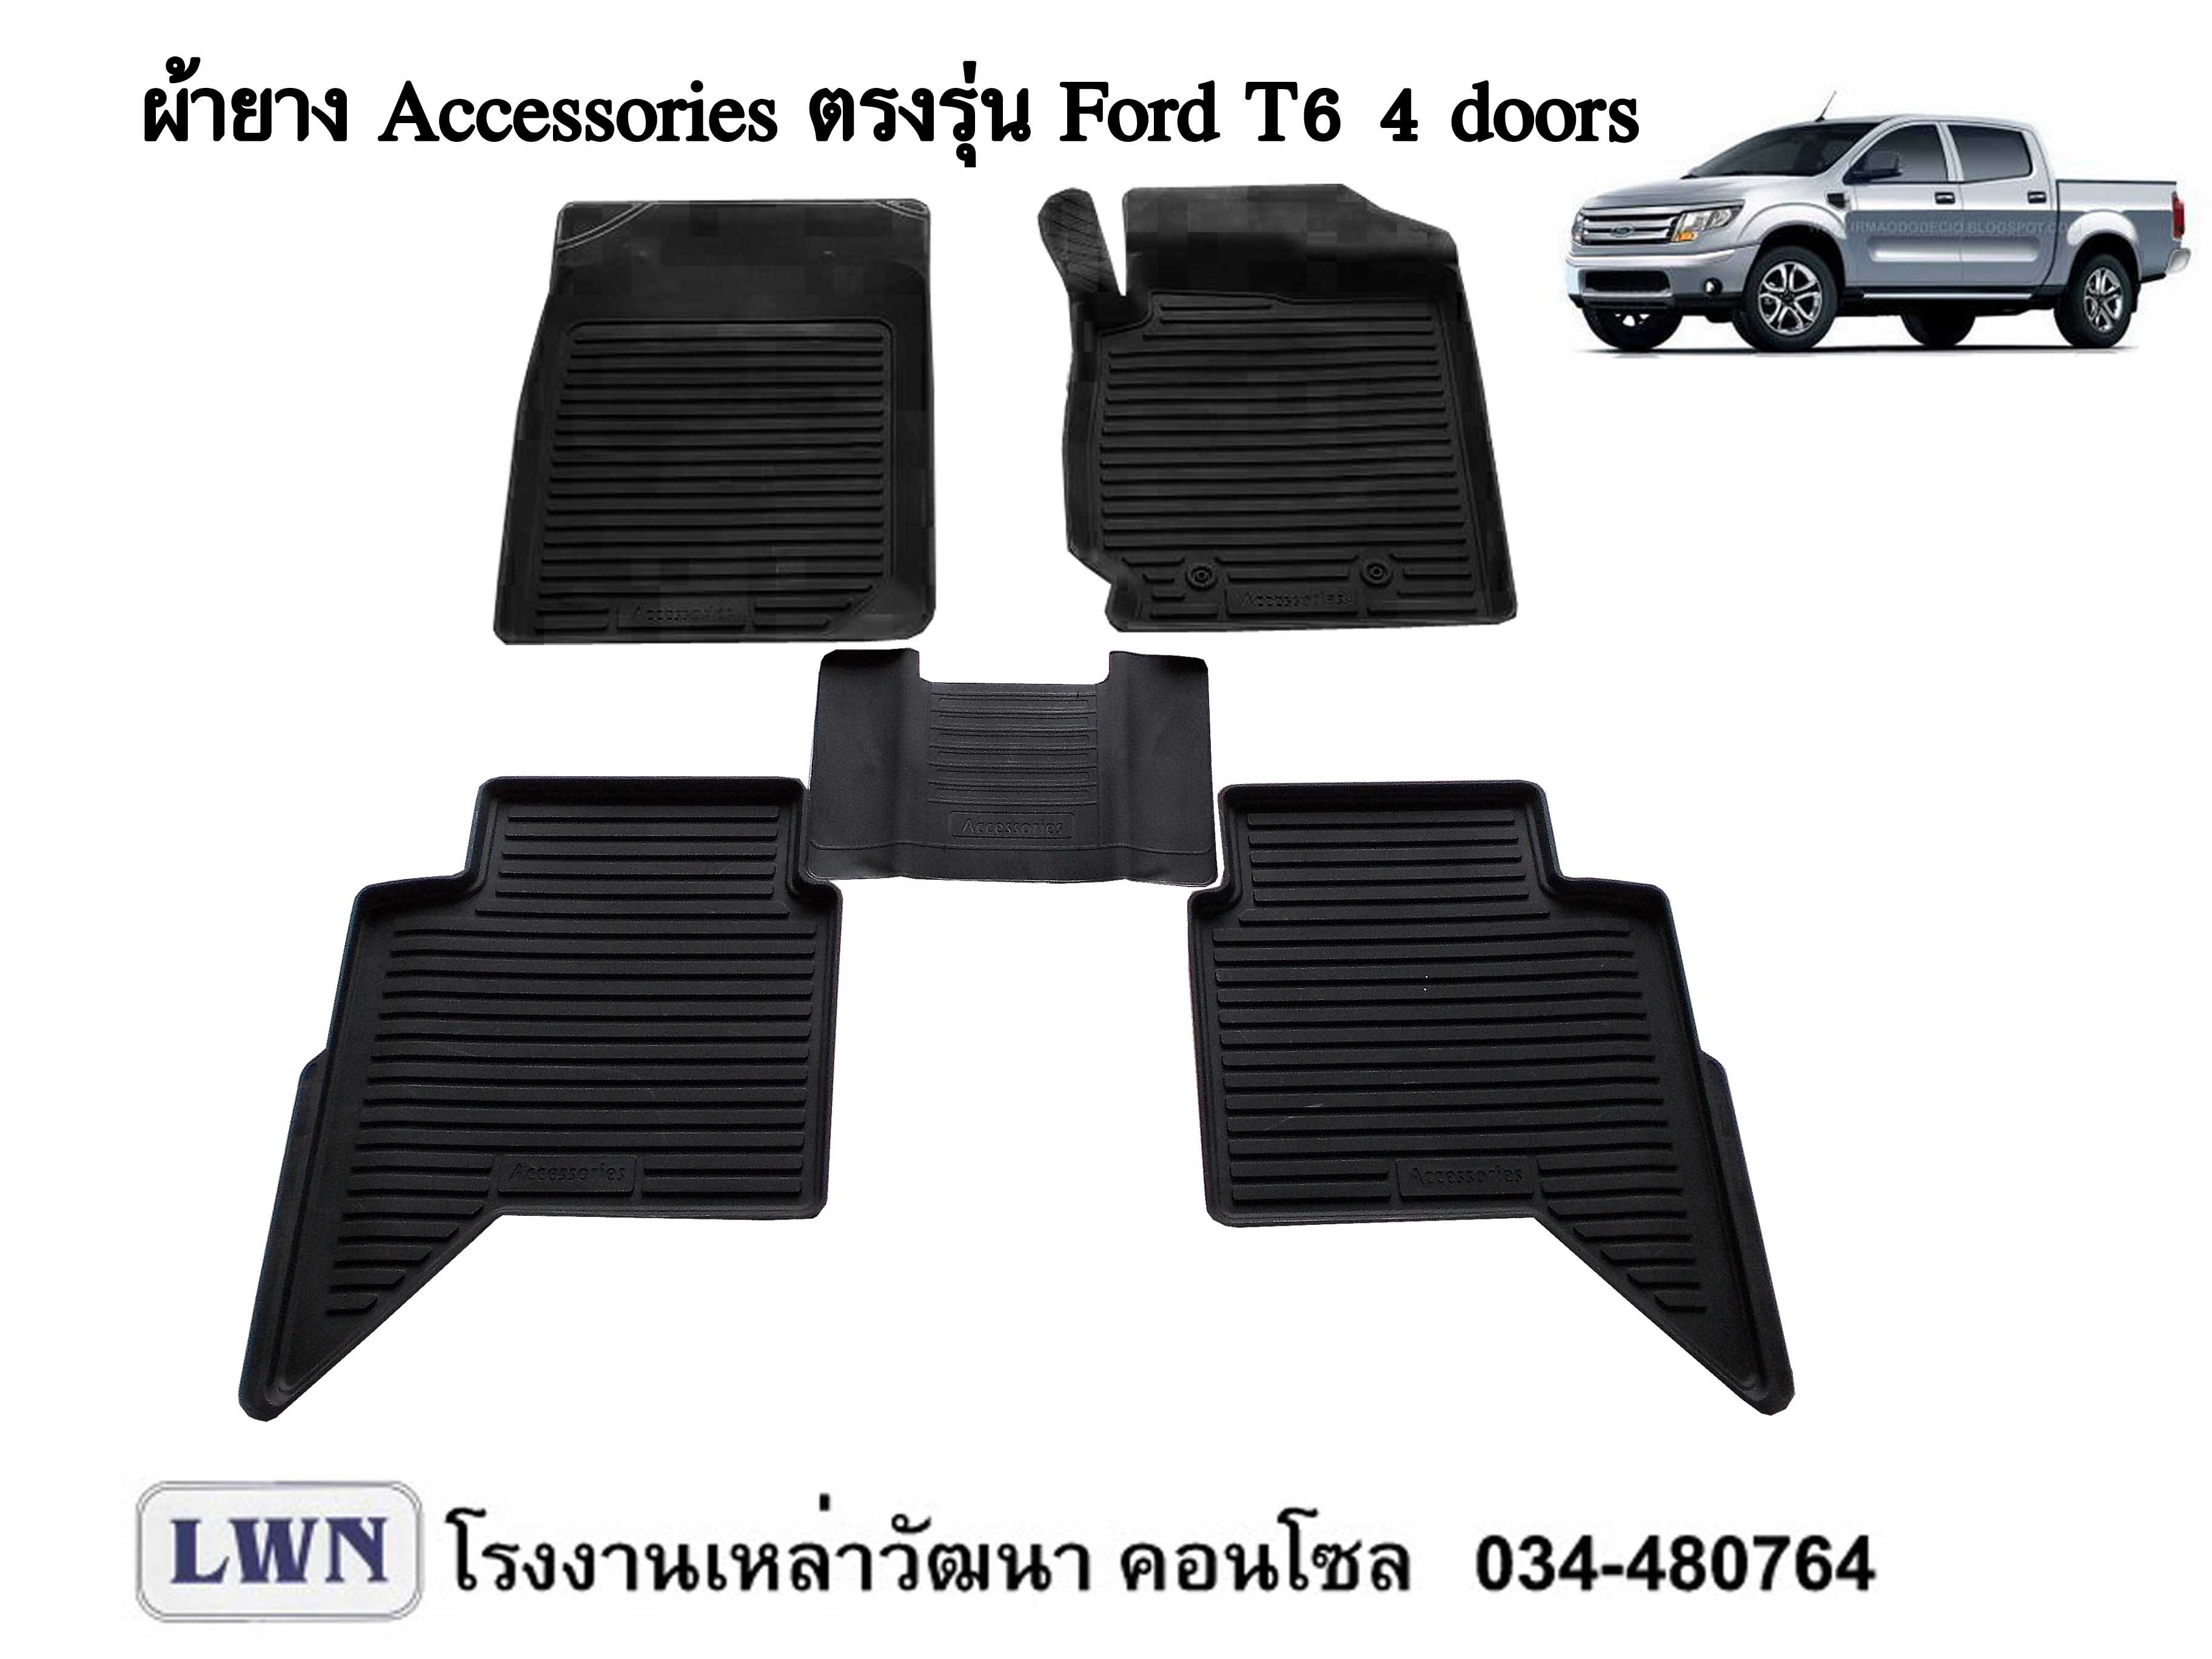 Car Floor Mat for Ford Ranger Double Cab